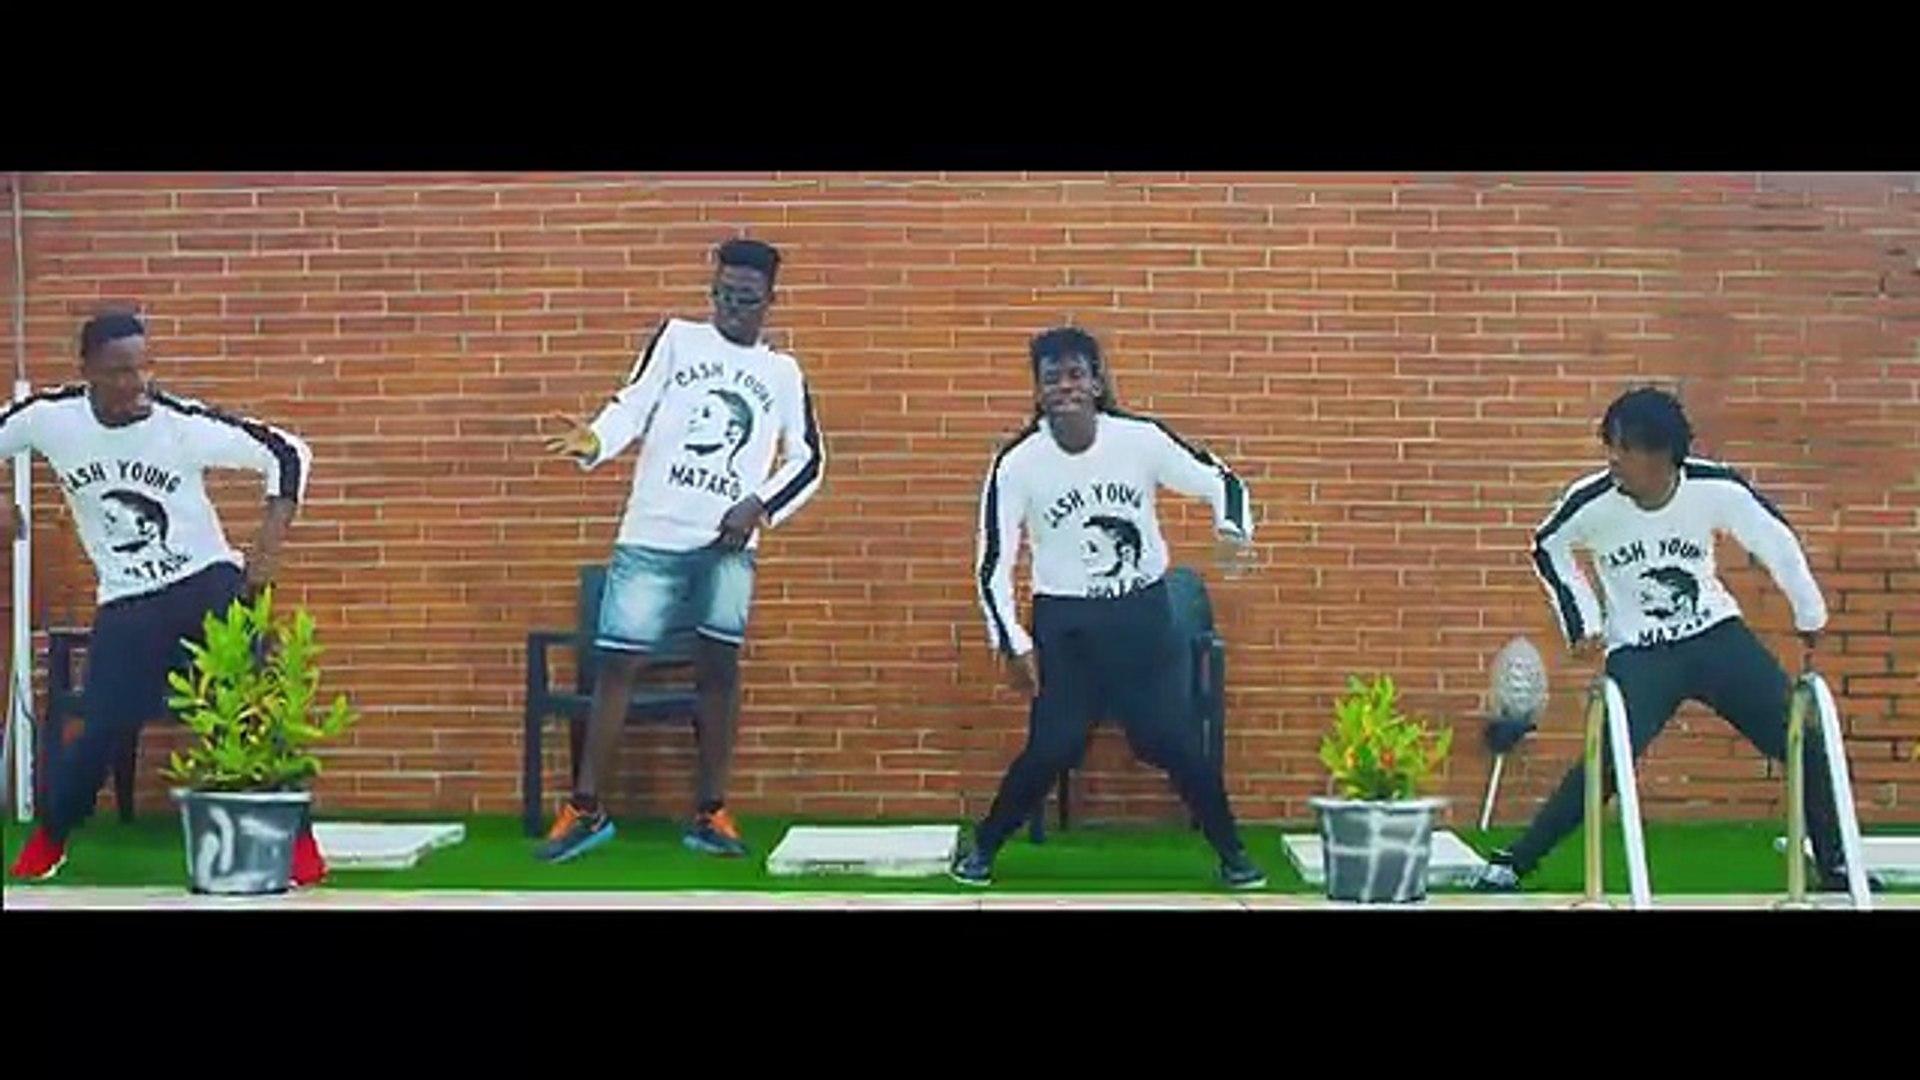 Latest Nigerian Music Video 2017 CASHYOUNG - MATAKO (OFFICIAL VIDEO)